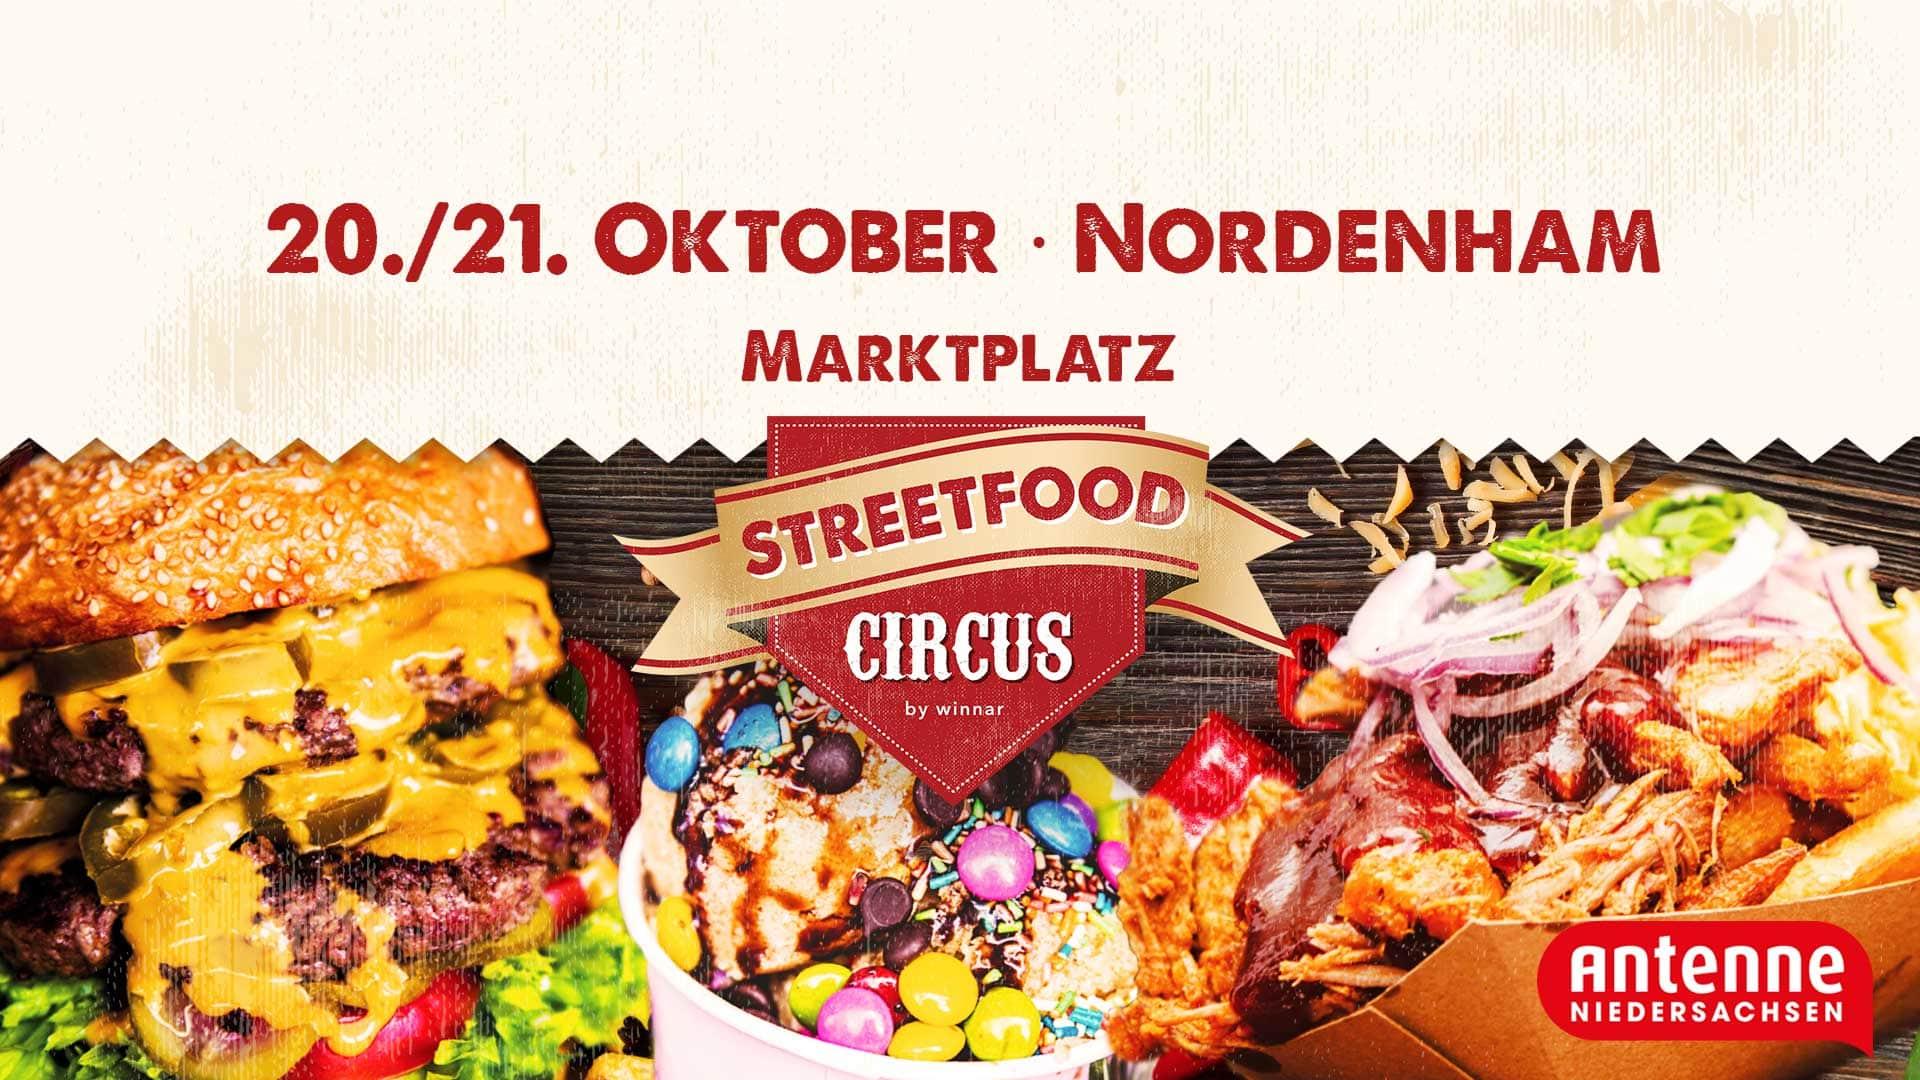 Streetfoodcircus Nordenham